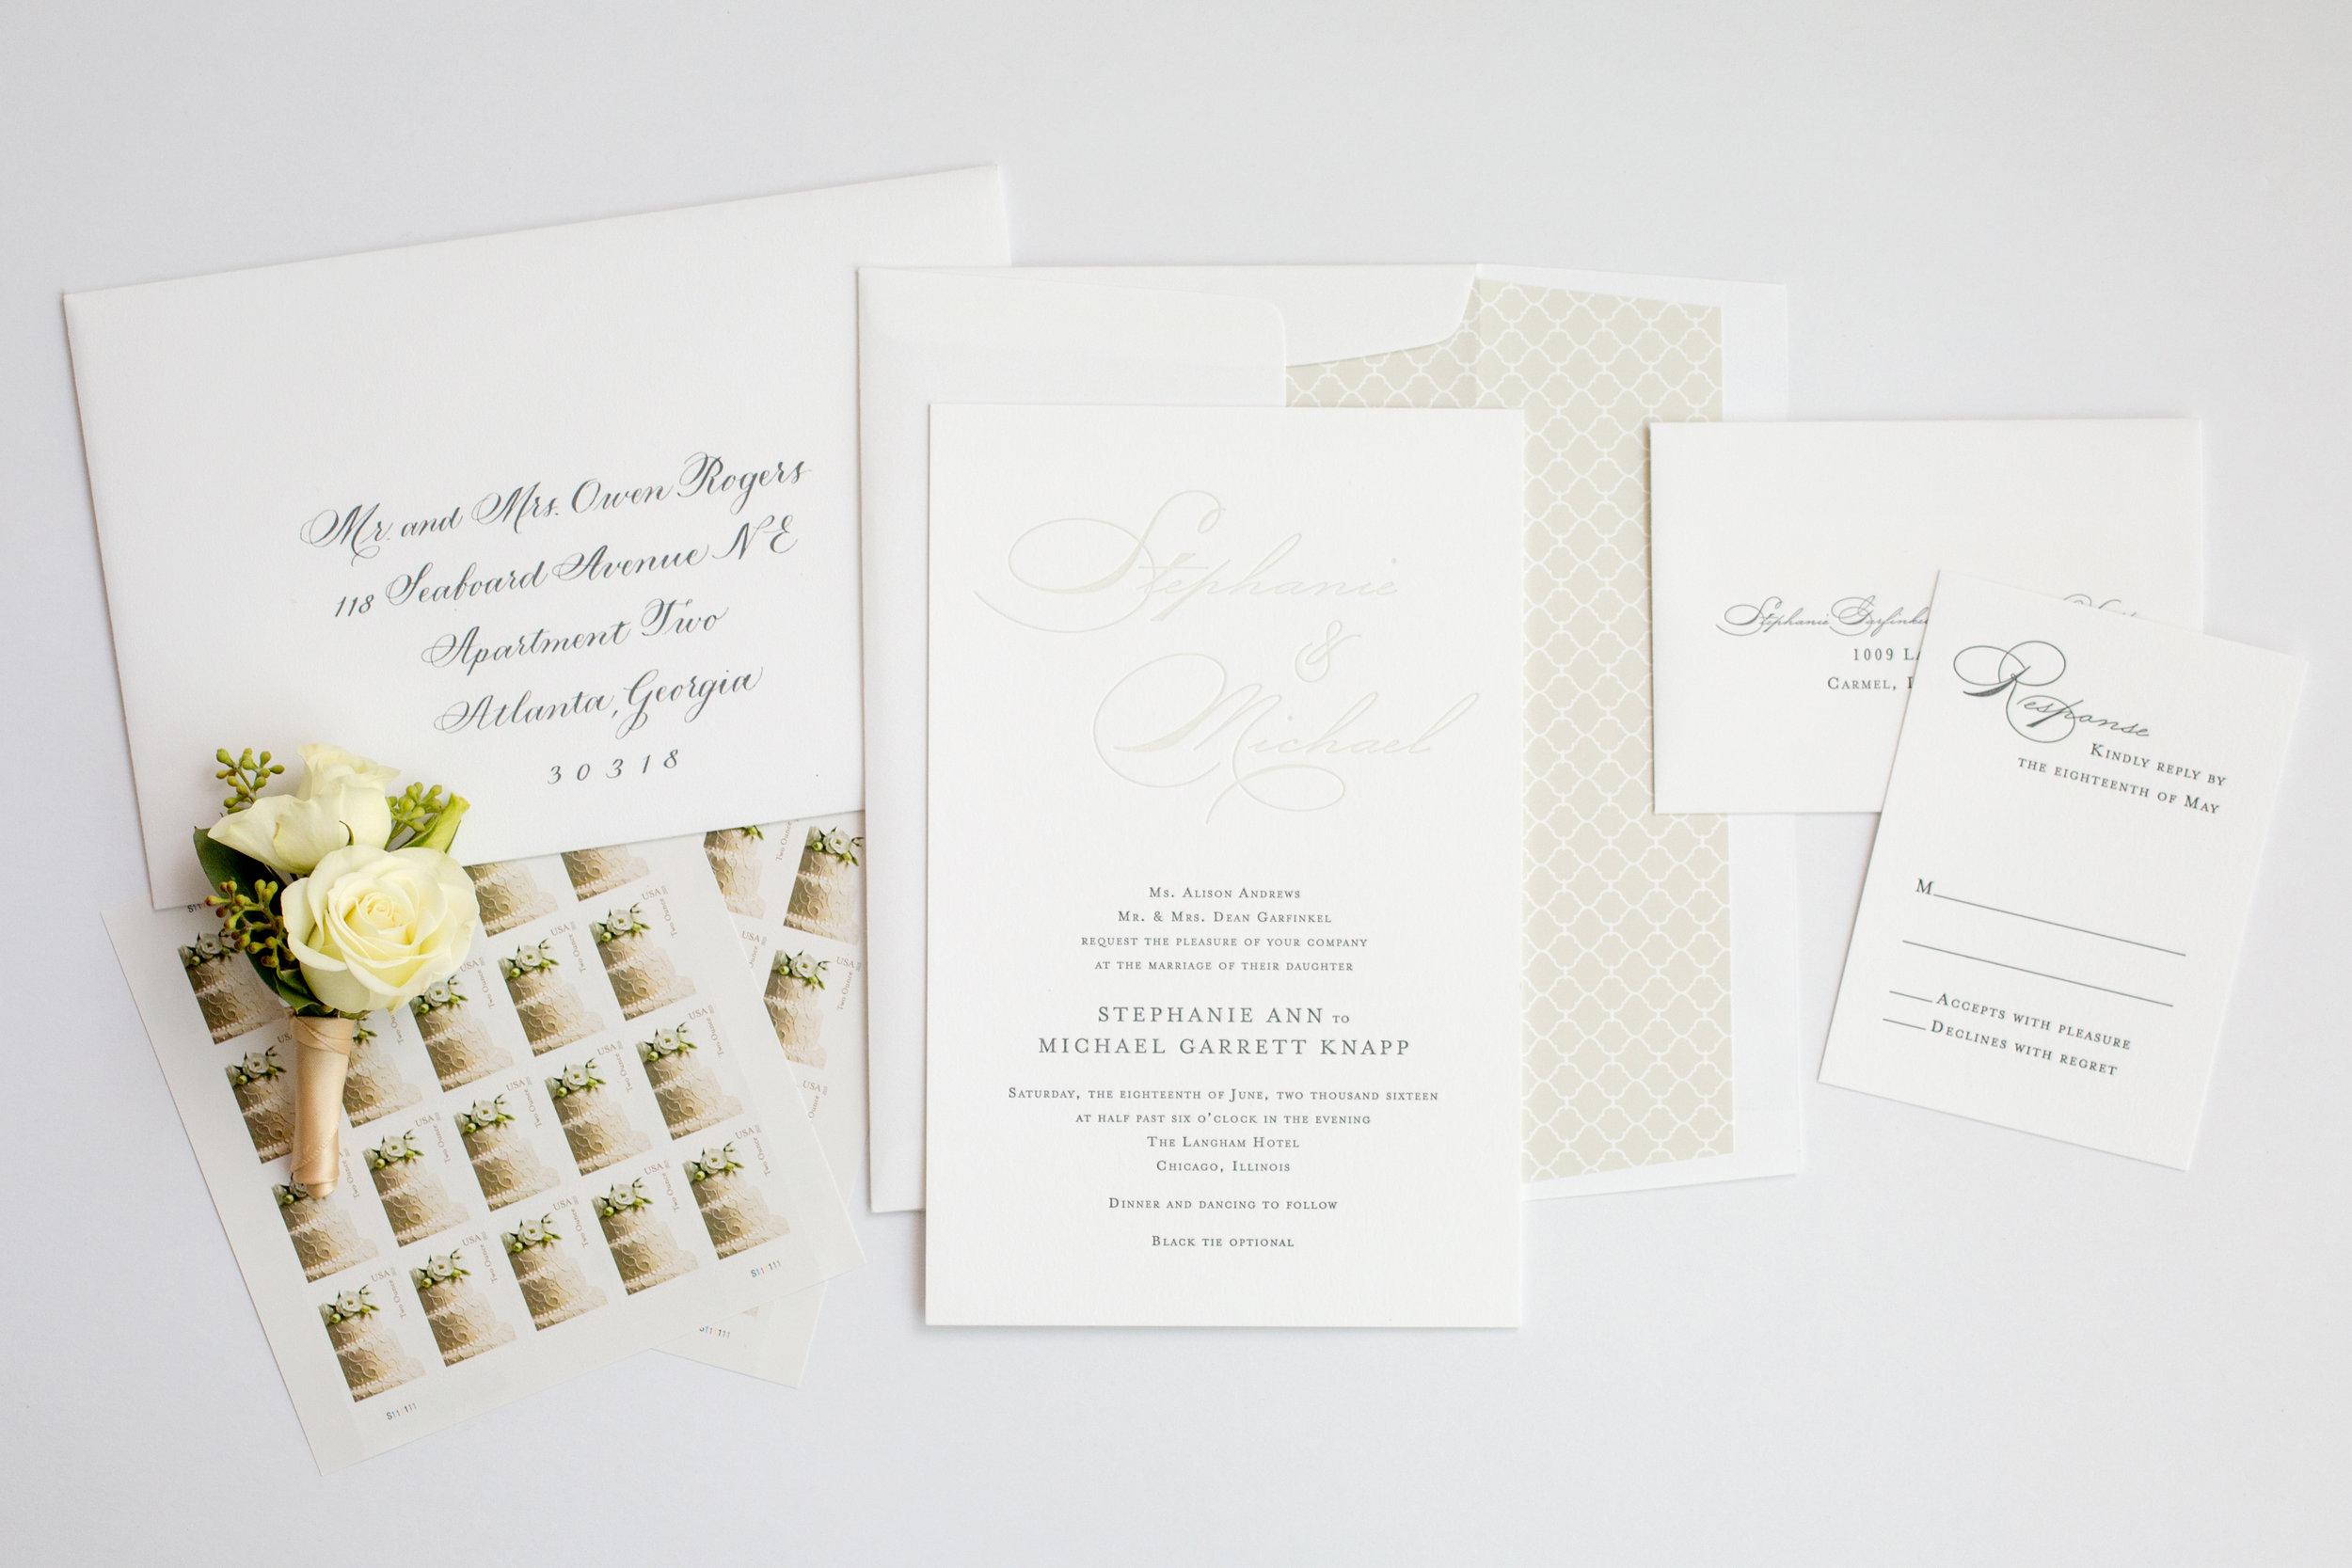 magnificent milestones | wedding invitations | formal collection